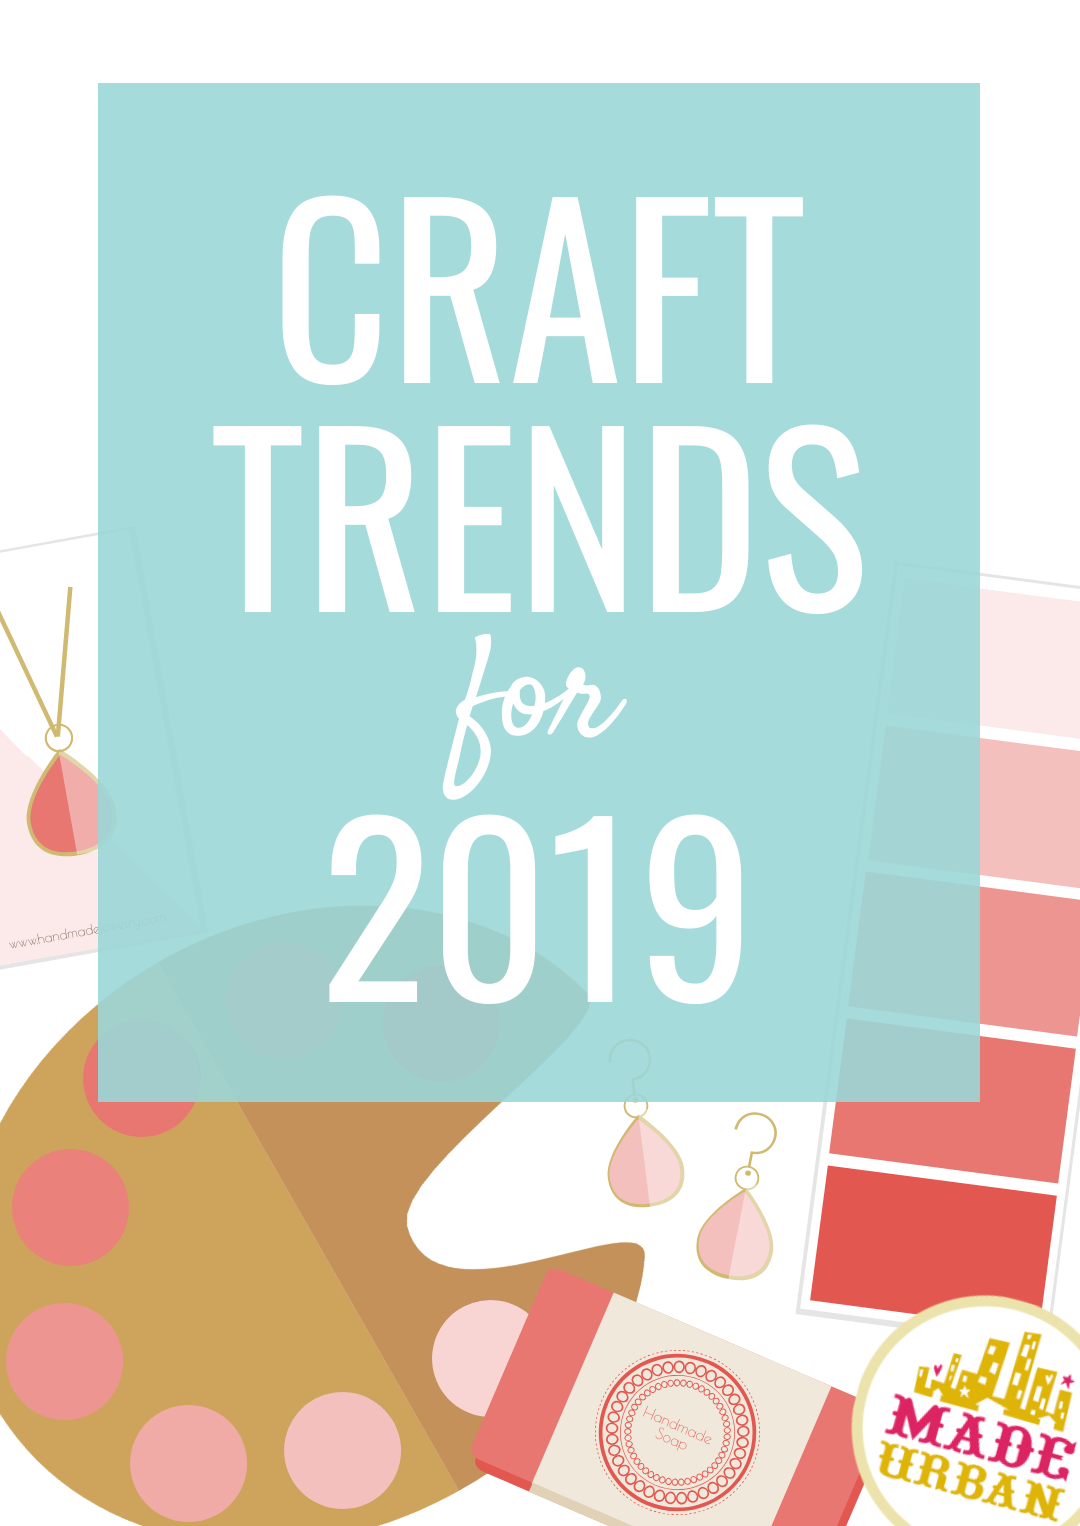 Craft Trends for 2019 | Craft Fair Ideas | Crafts, Trending